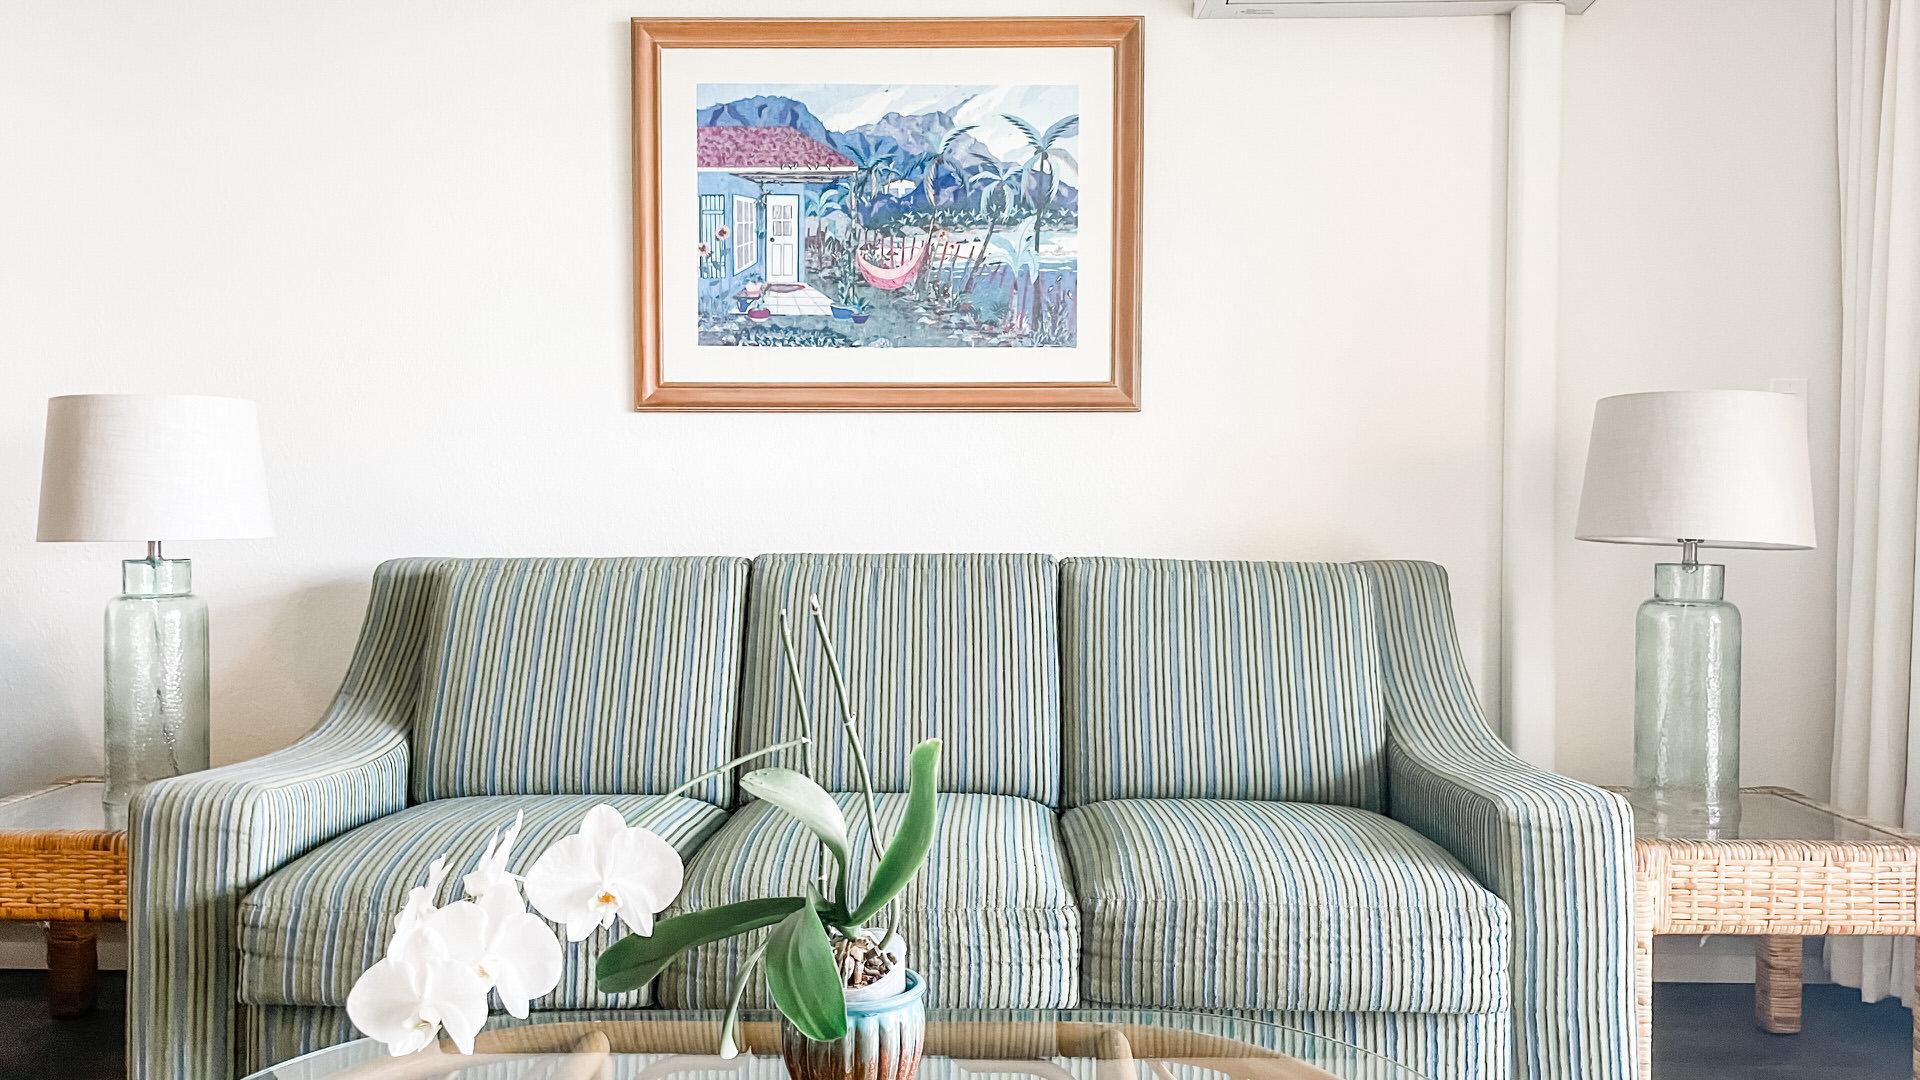 B210 Sofa and Coffee Table